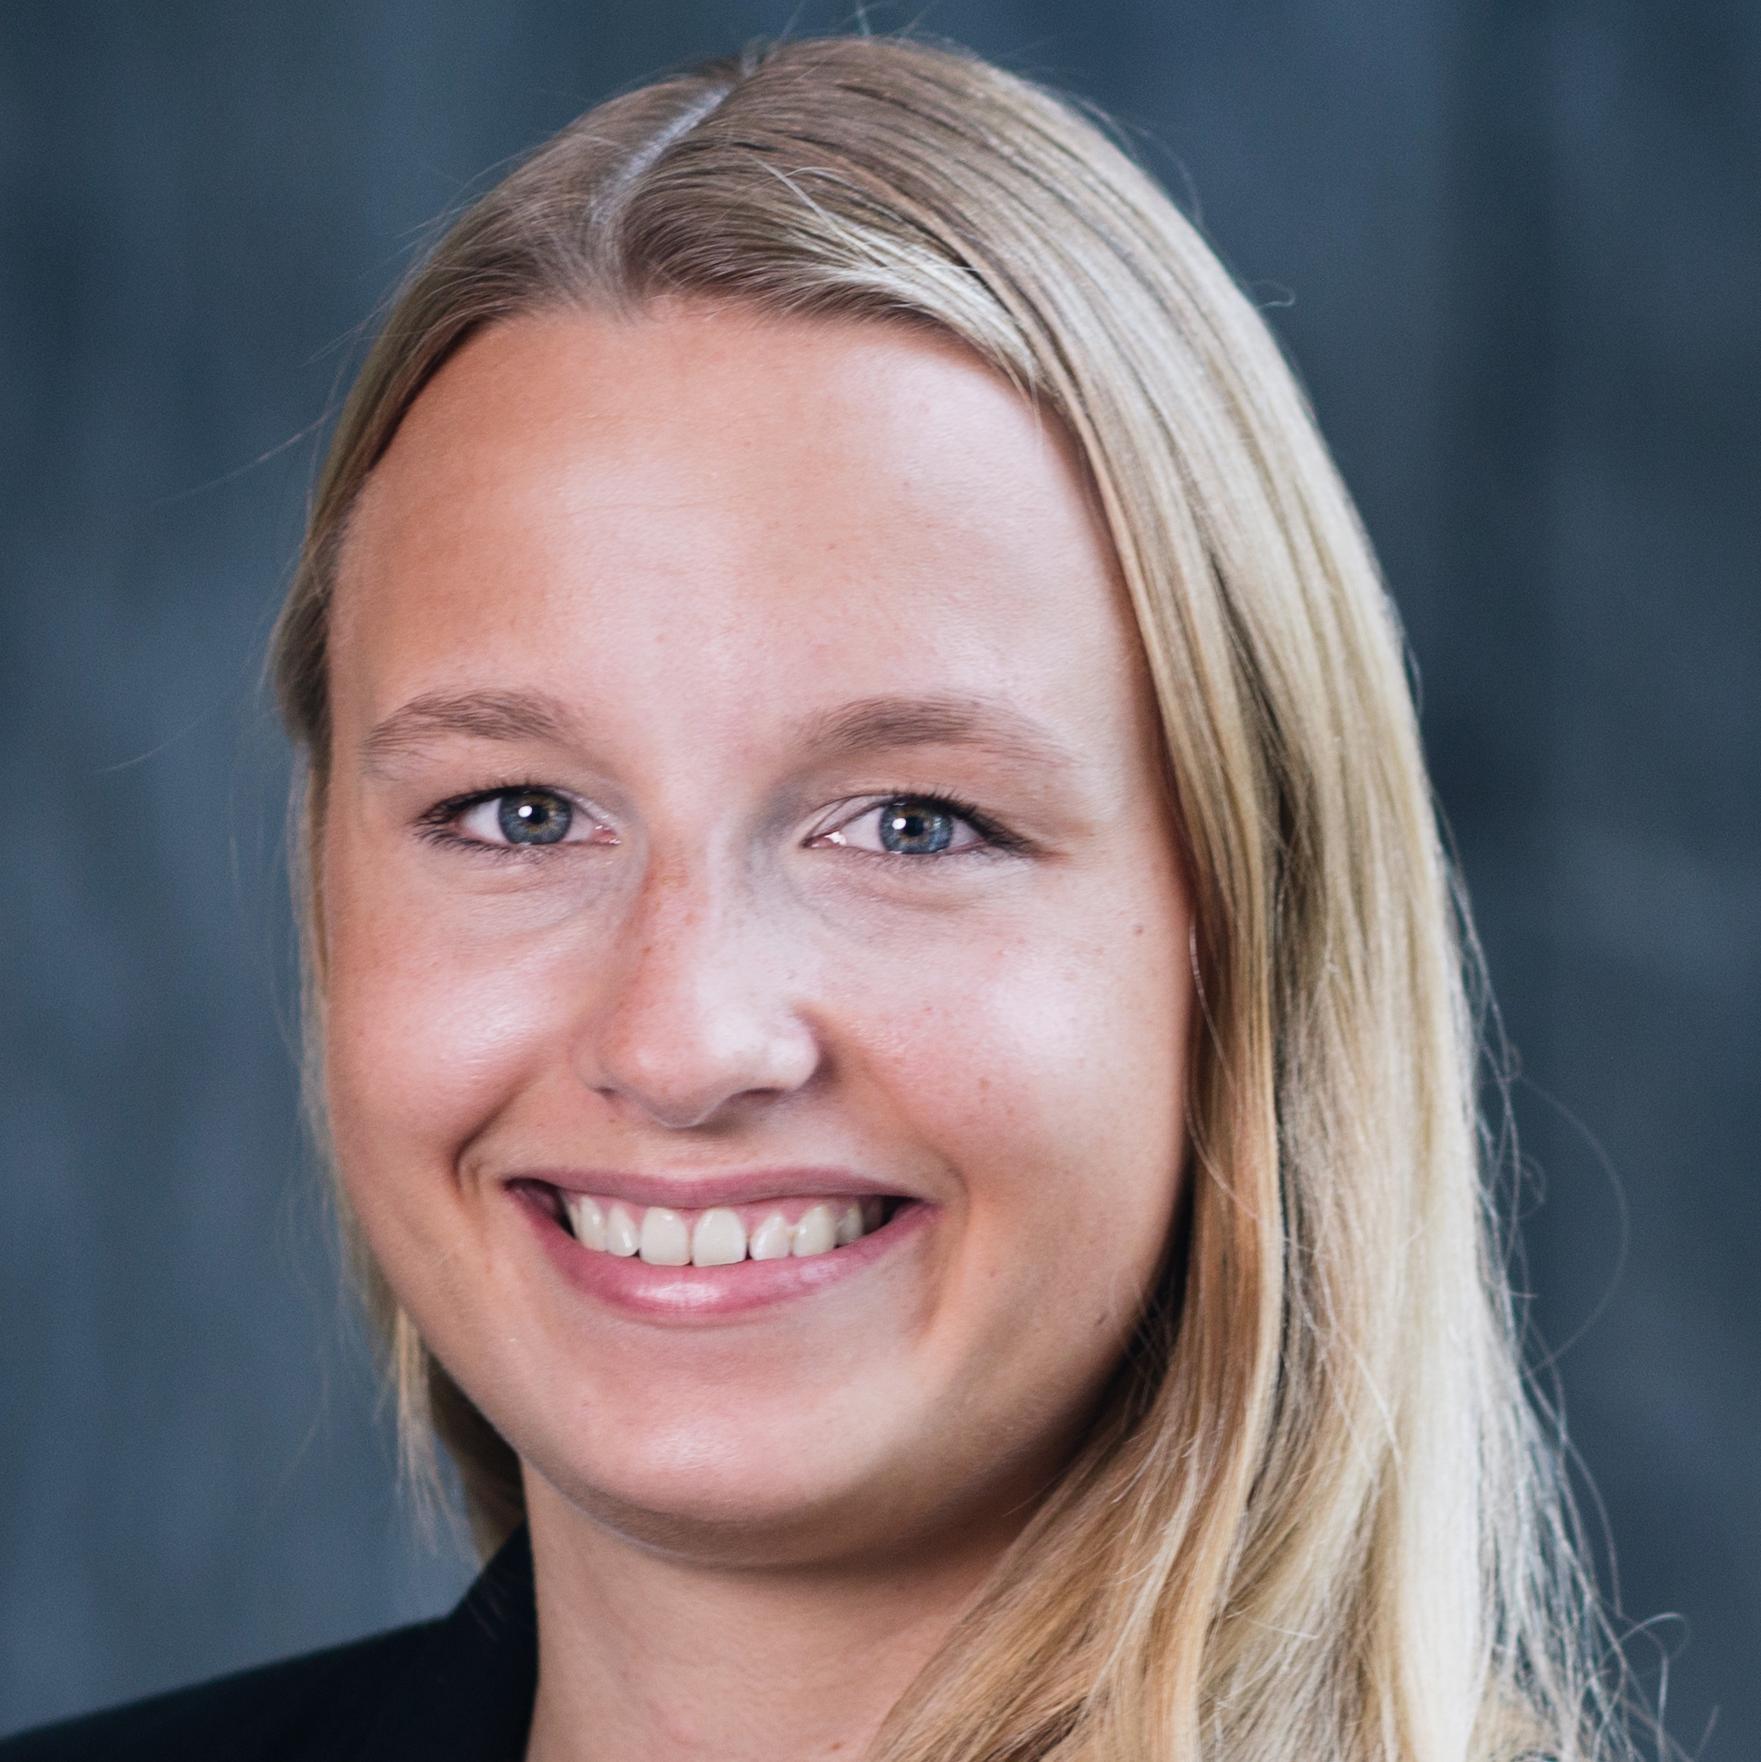 Stefanie Ritter